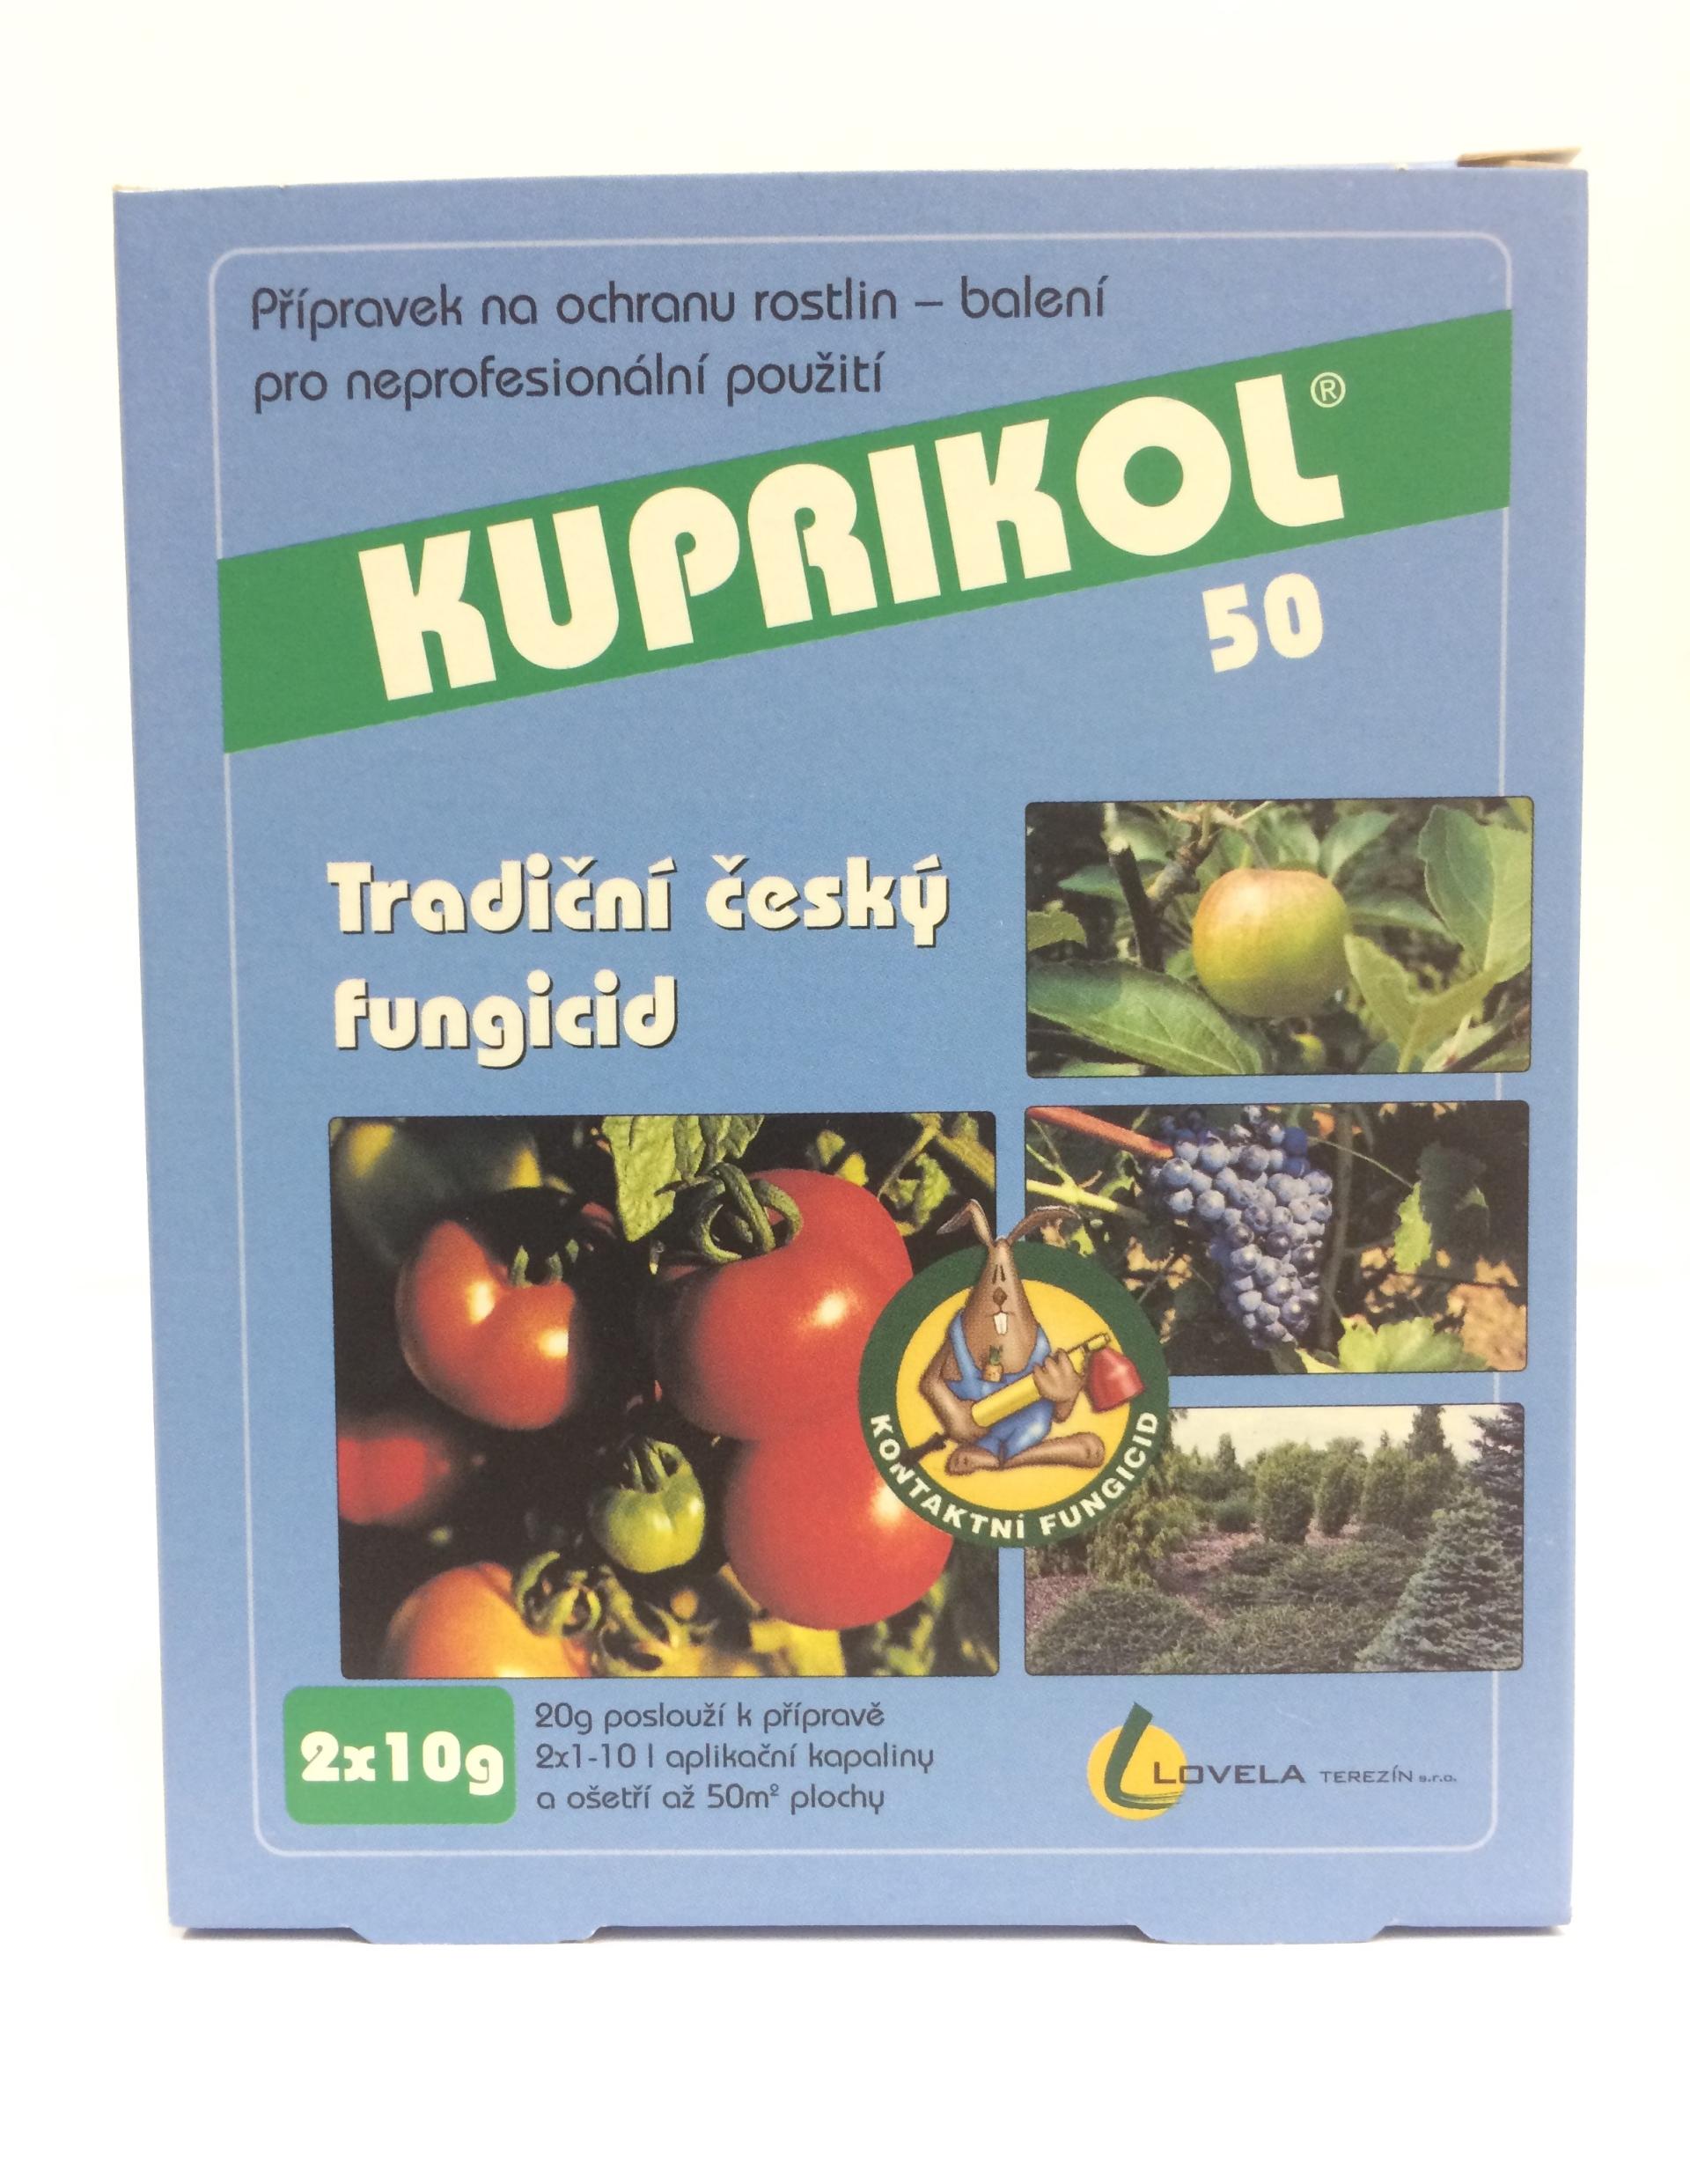 Kuprikol 50 2x10 g proti houbovým chorobám